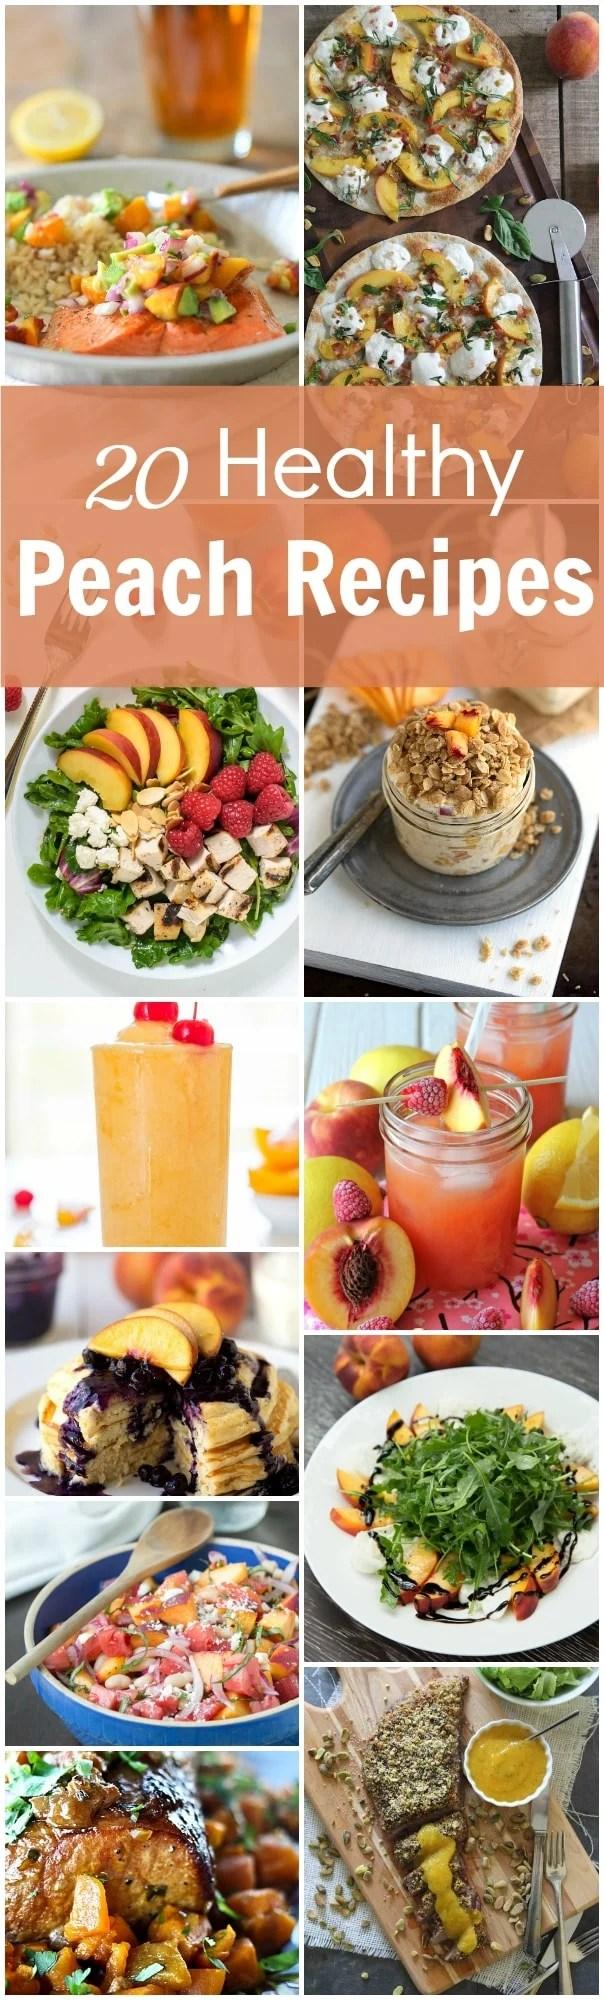 20 Healthy Peach Recipes.